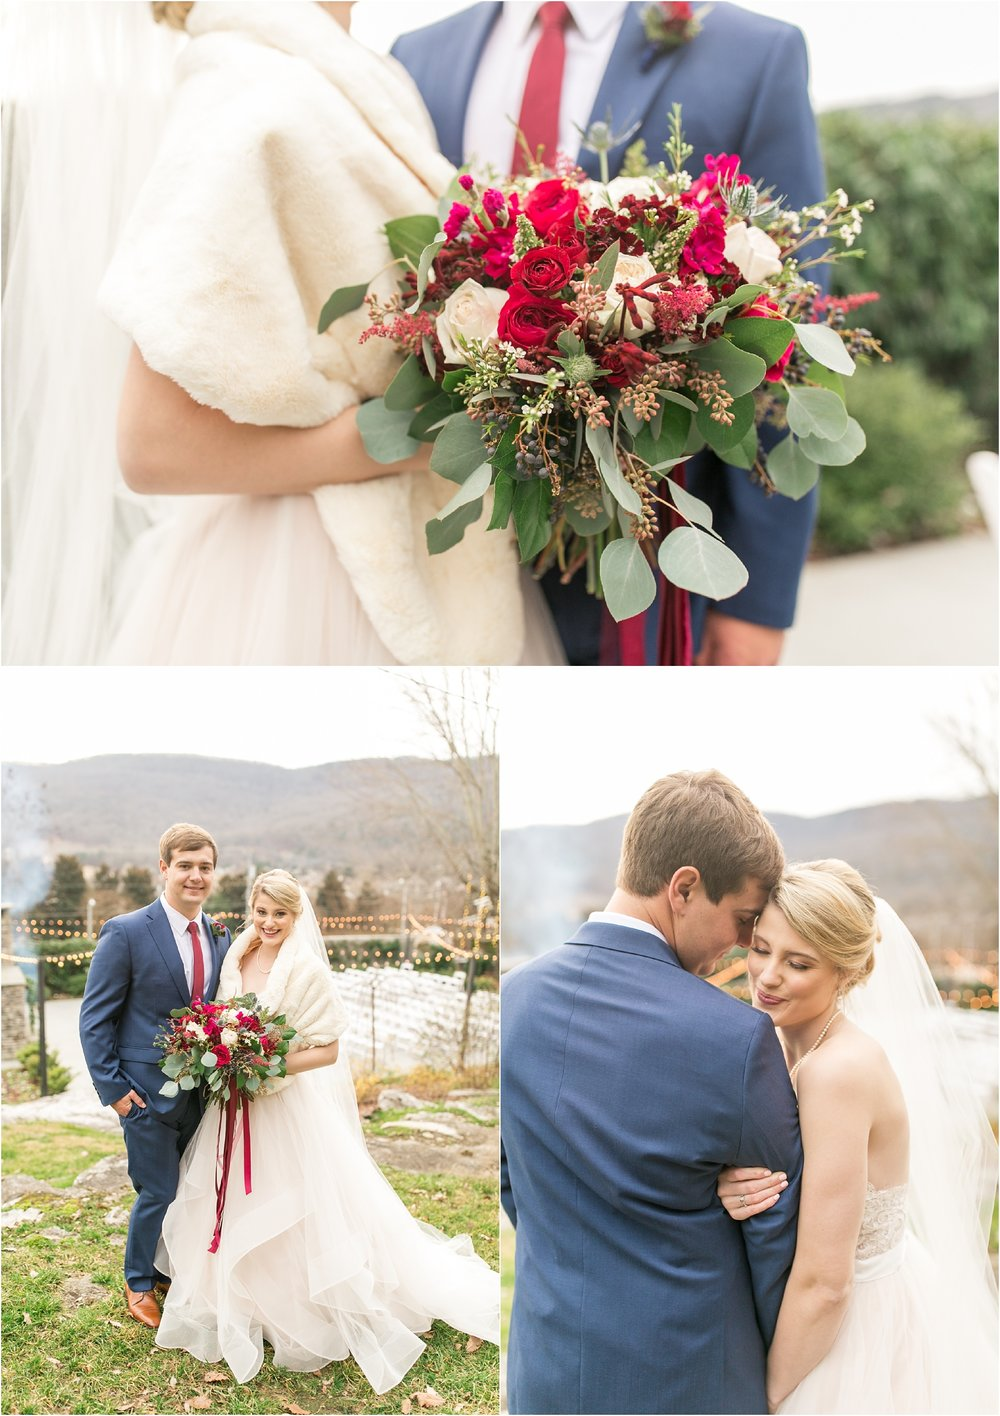 Savannah Eve Photography- Brandon-Brown Wedding-82.jpg